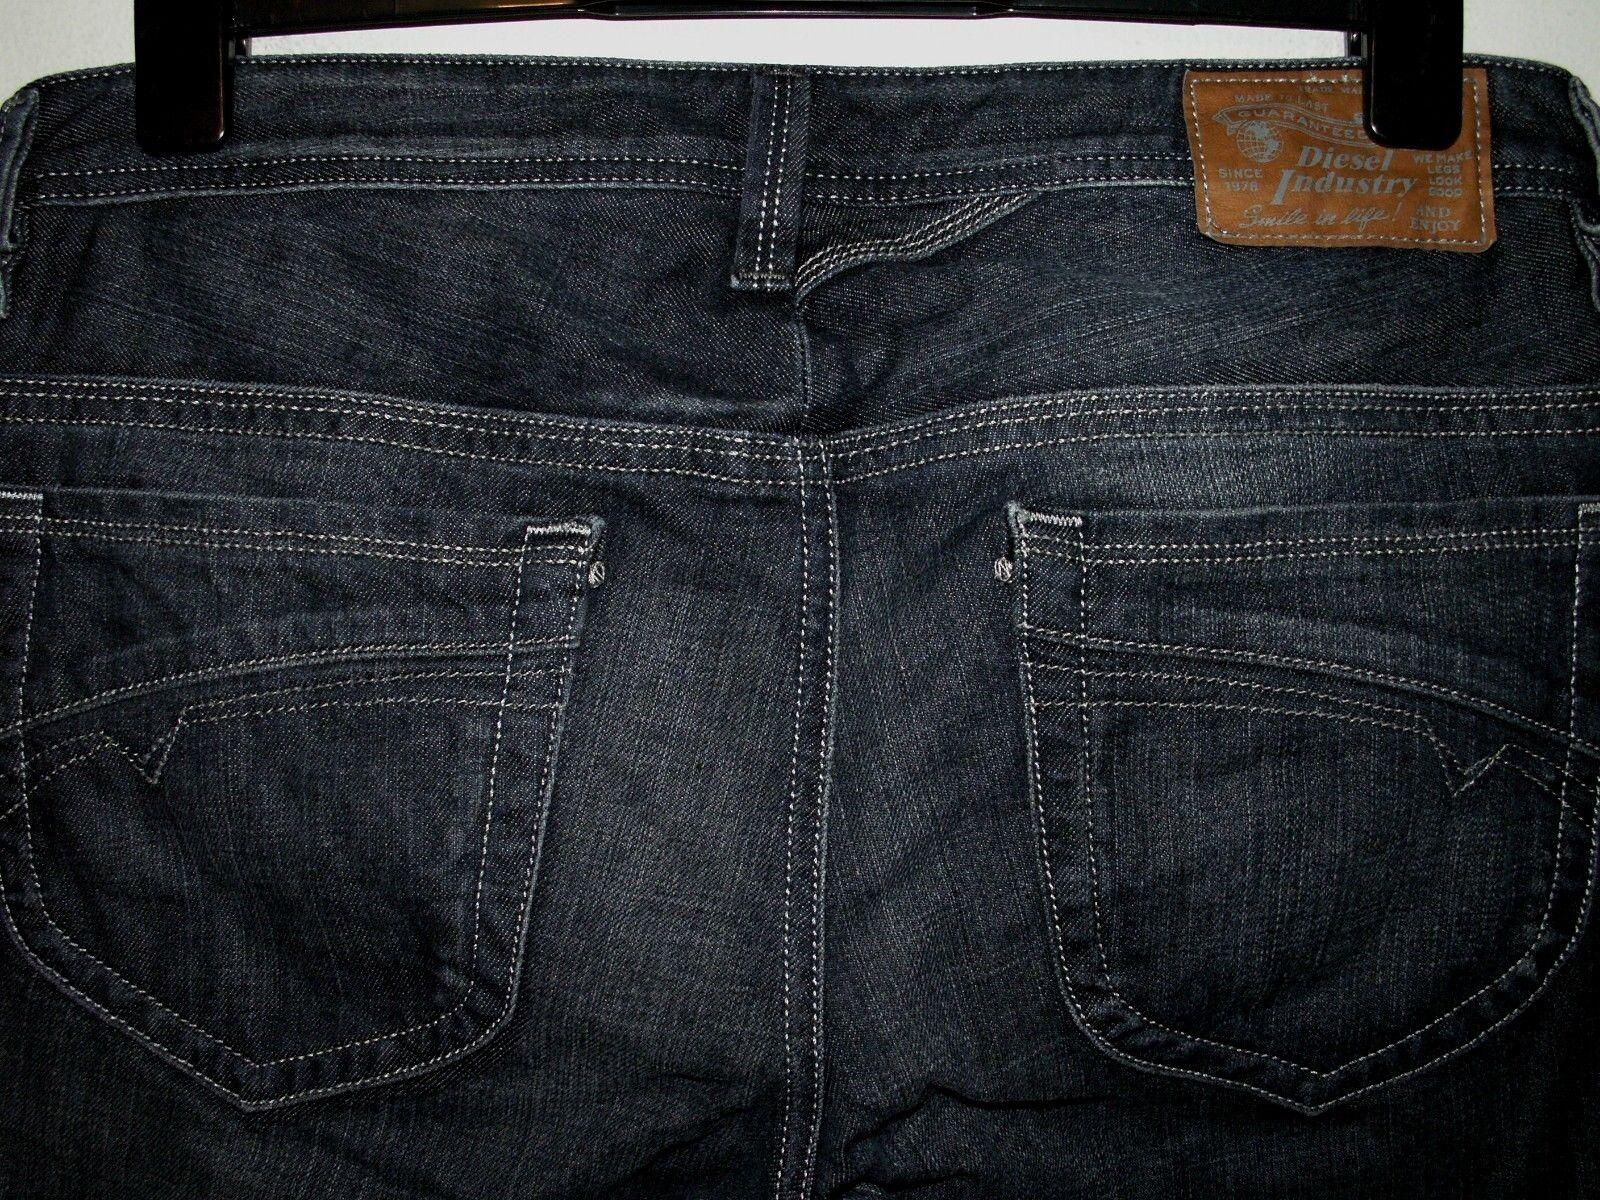 f7a5aed7 NWT Men's Paper Denim Cloth PD&C 36x32 P90W2PD5 Slim Straight bluee Jeans